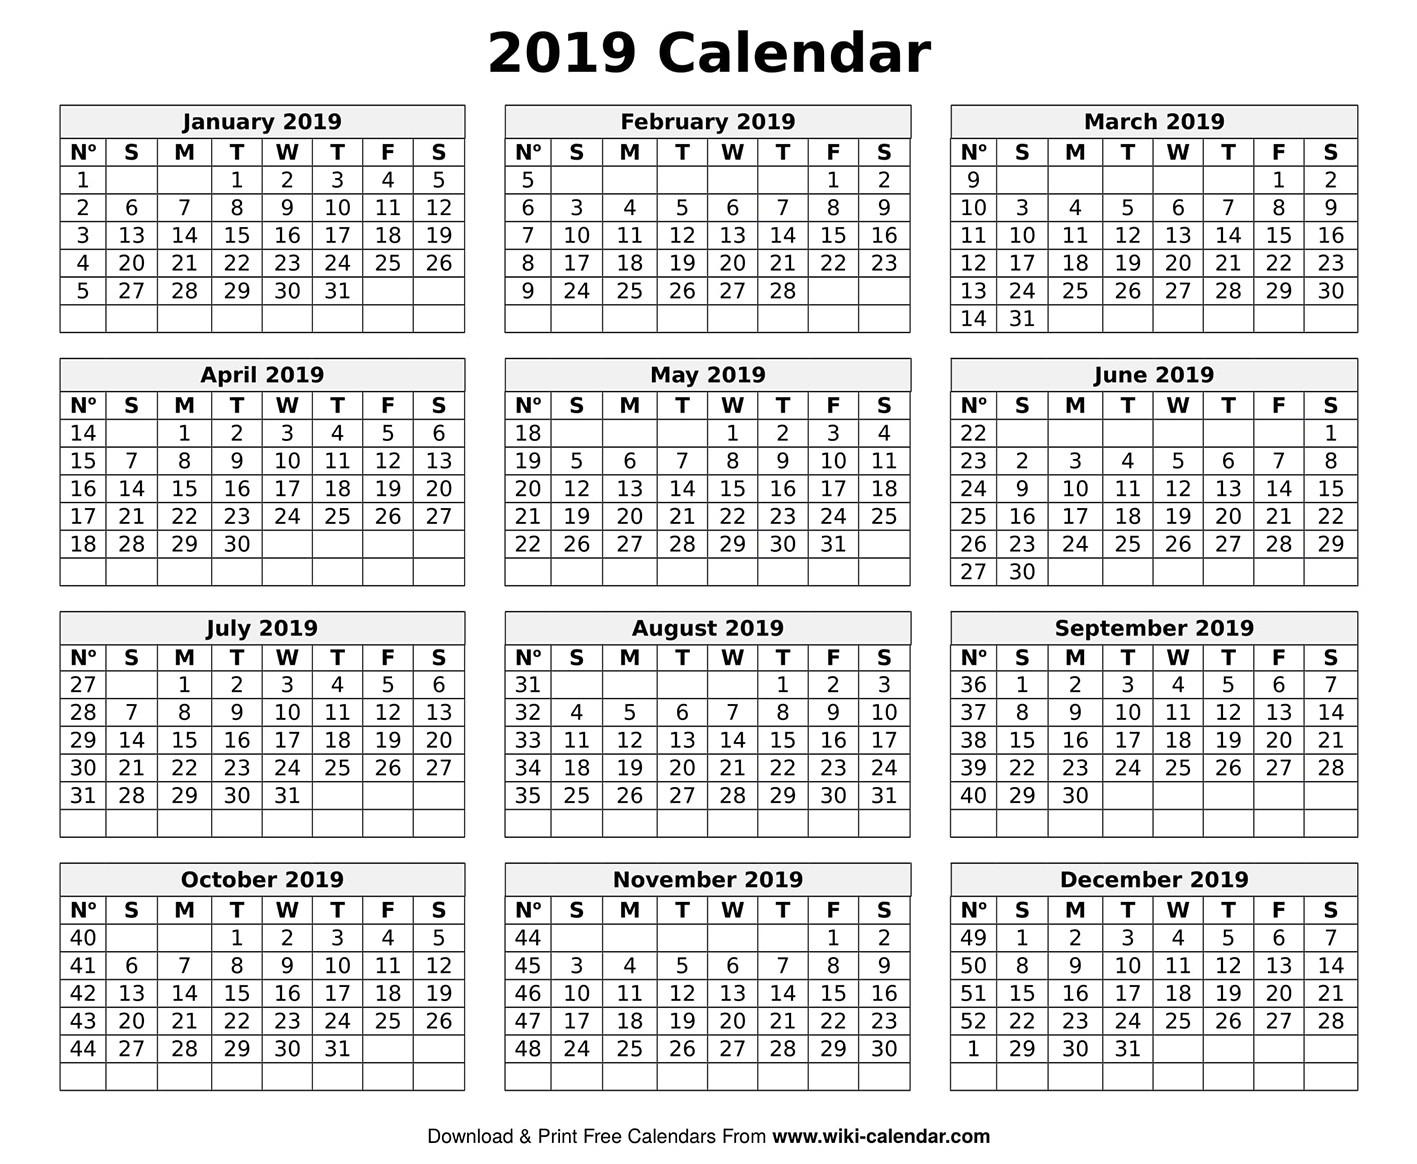 Printable Blank 2019 Calendar Templates-Wiki Calendar January 2020